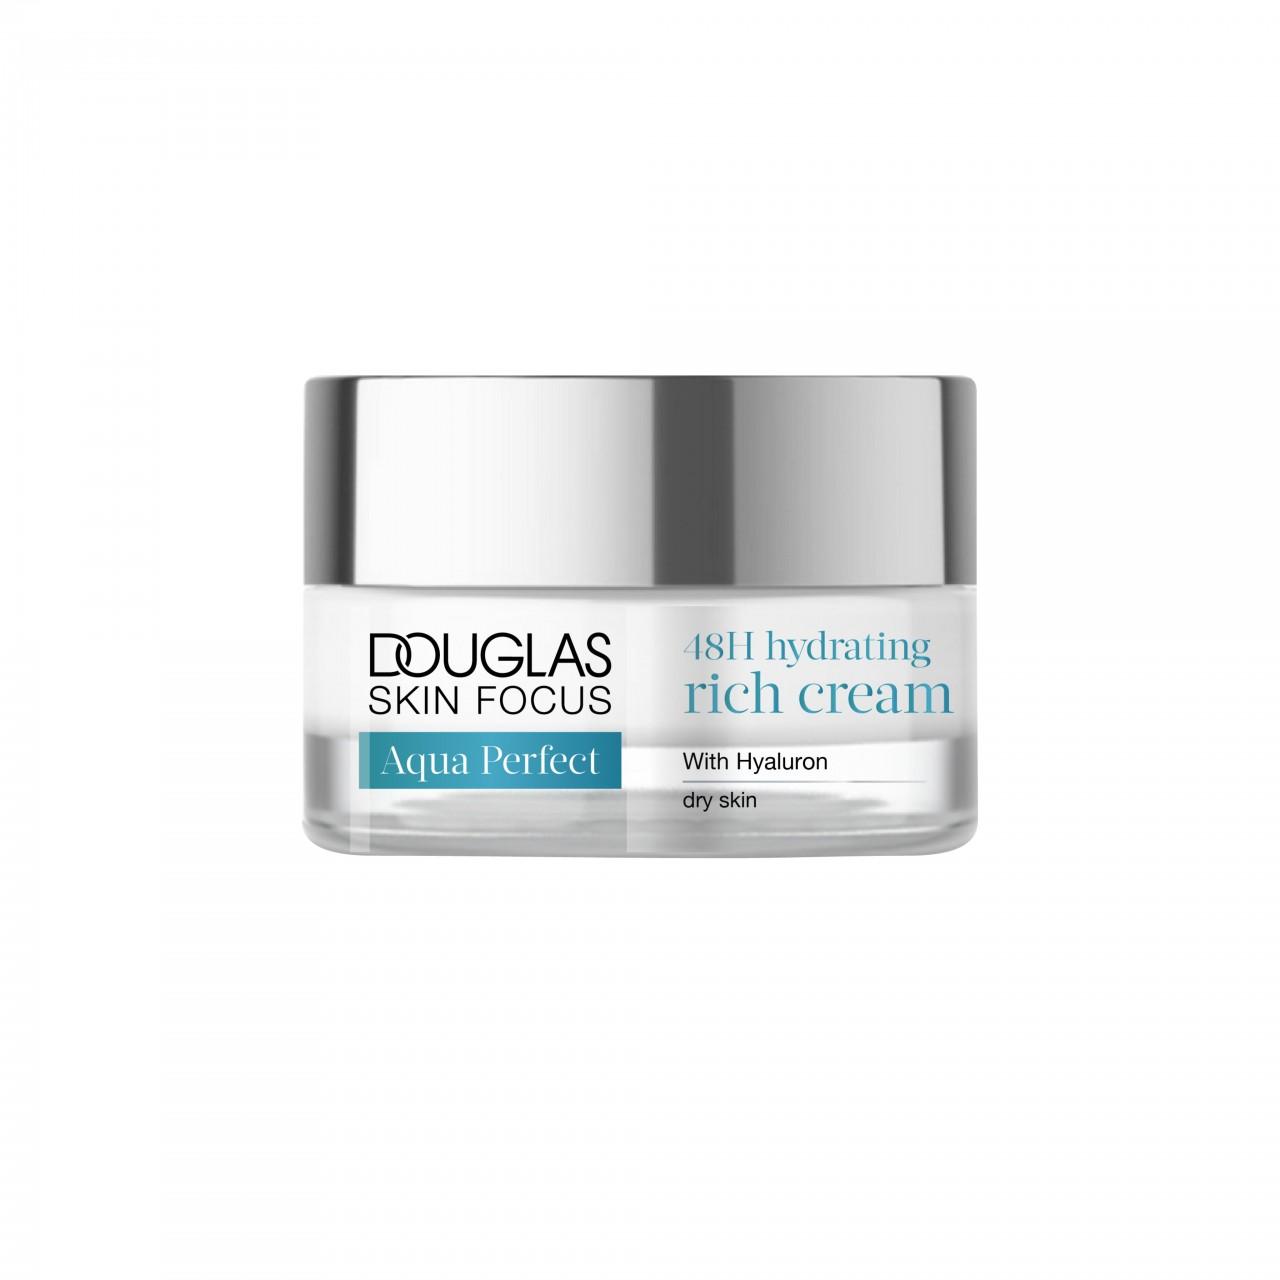 Douglas Focus 48H Hydrating Rich Cream